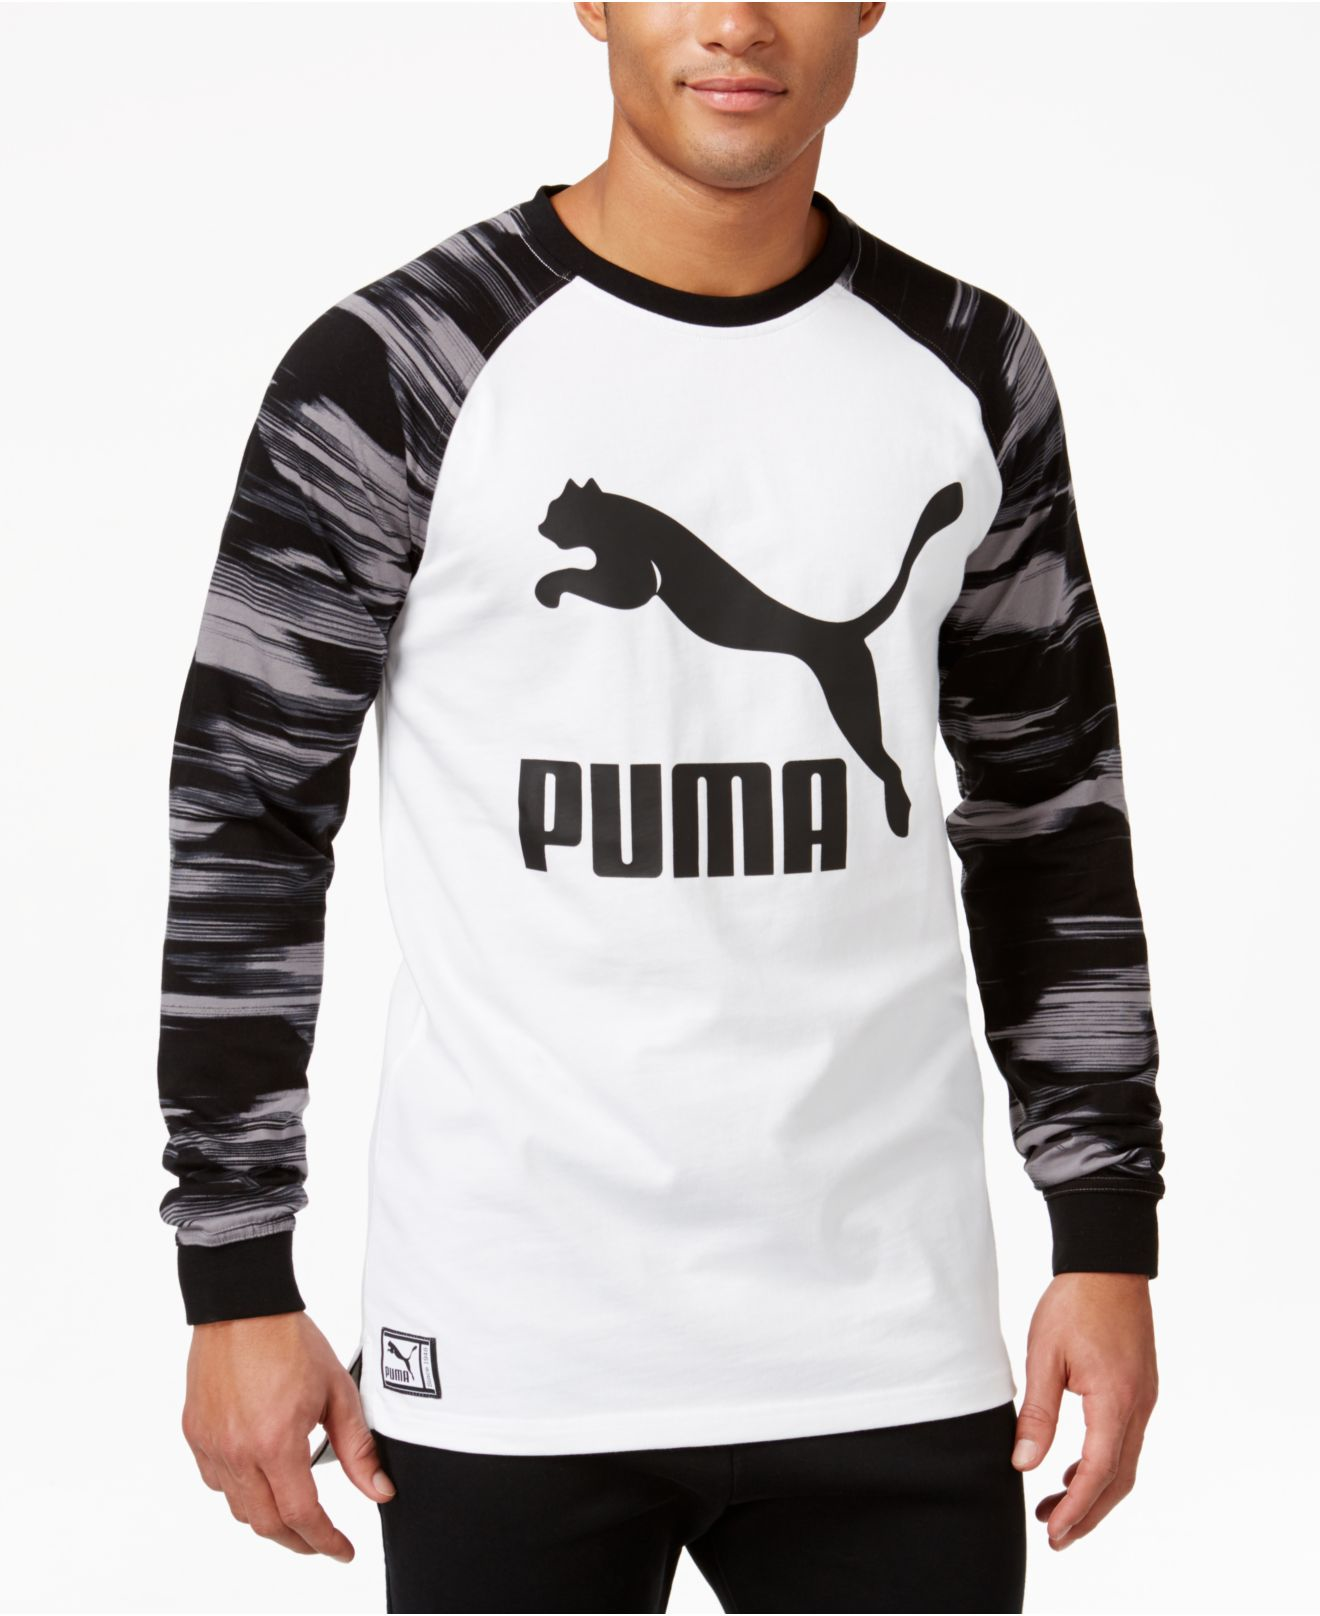 4b465301 White Men's Graphic Long-sleeve T-shirt